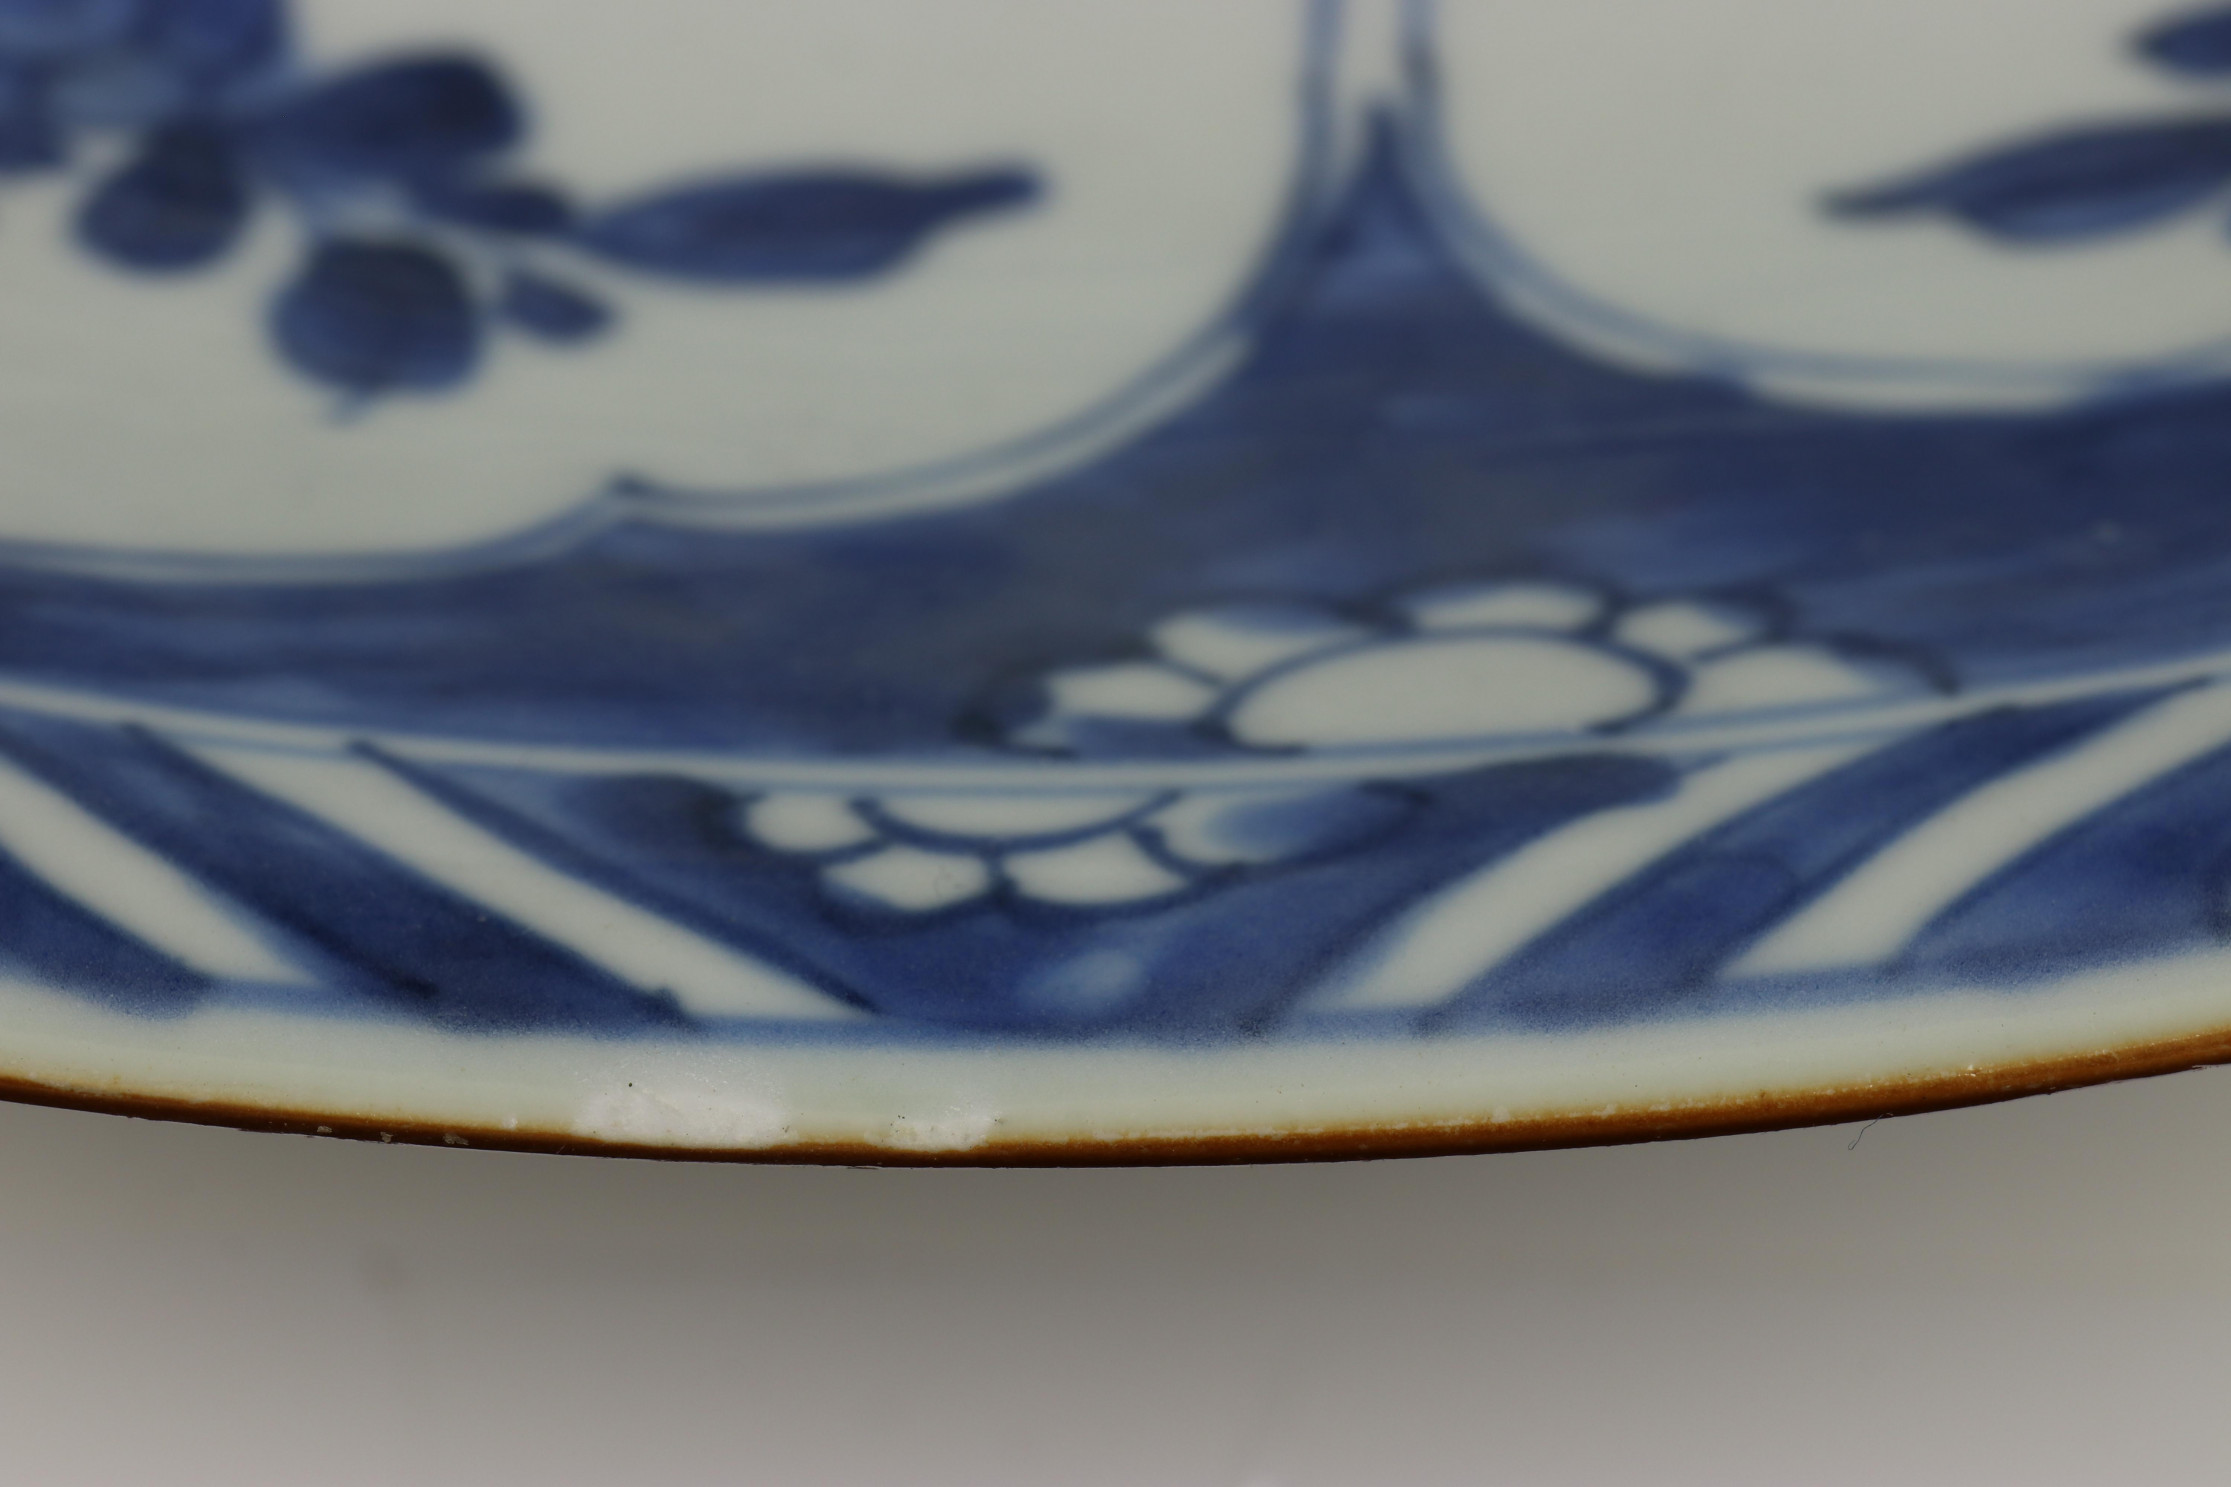 China, blauw-wit porseleinen schotel, laat Kangxi, - Image 7 of 7